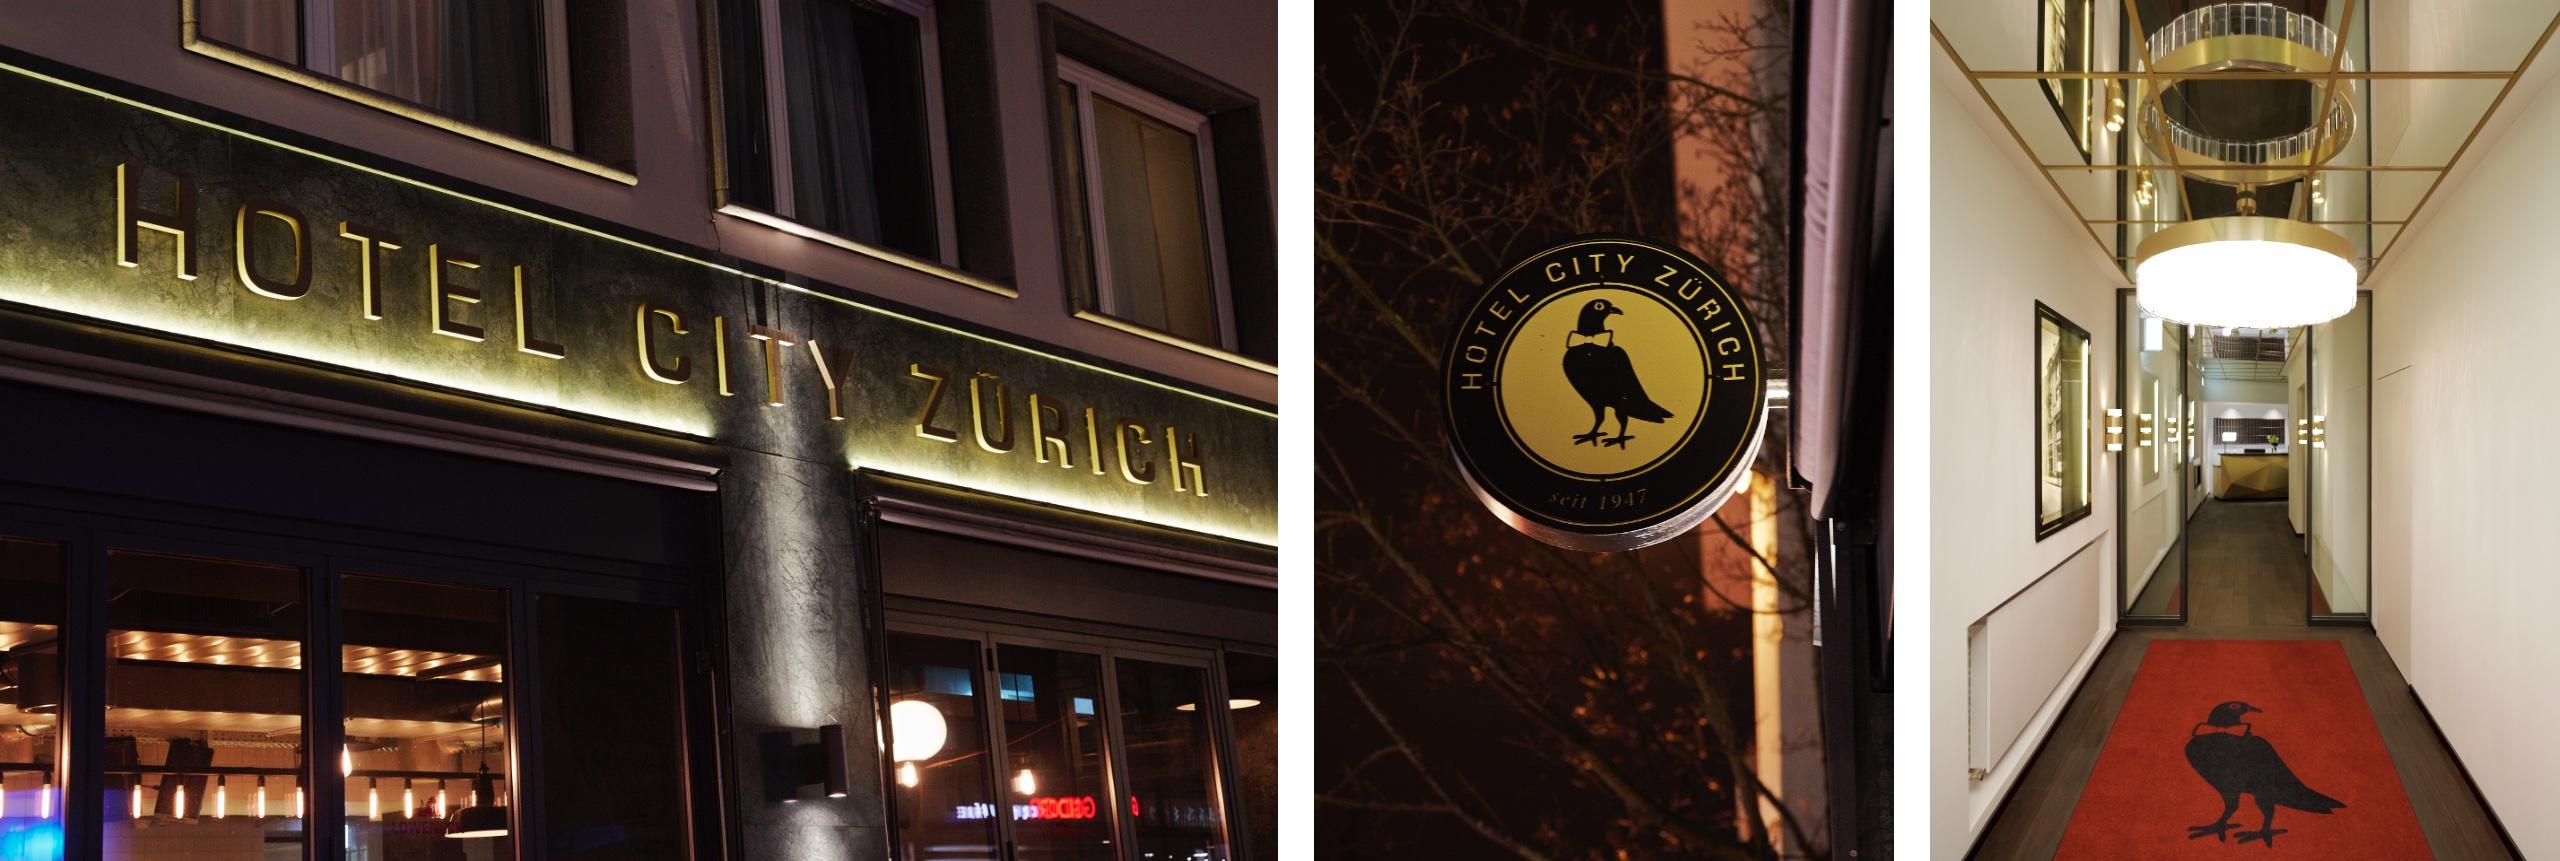 Hotel City Zürich Fassade, Logo, Lobby